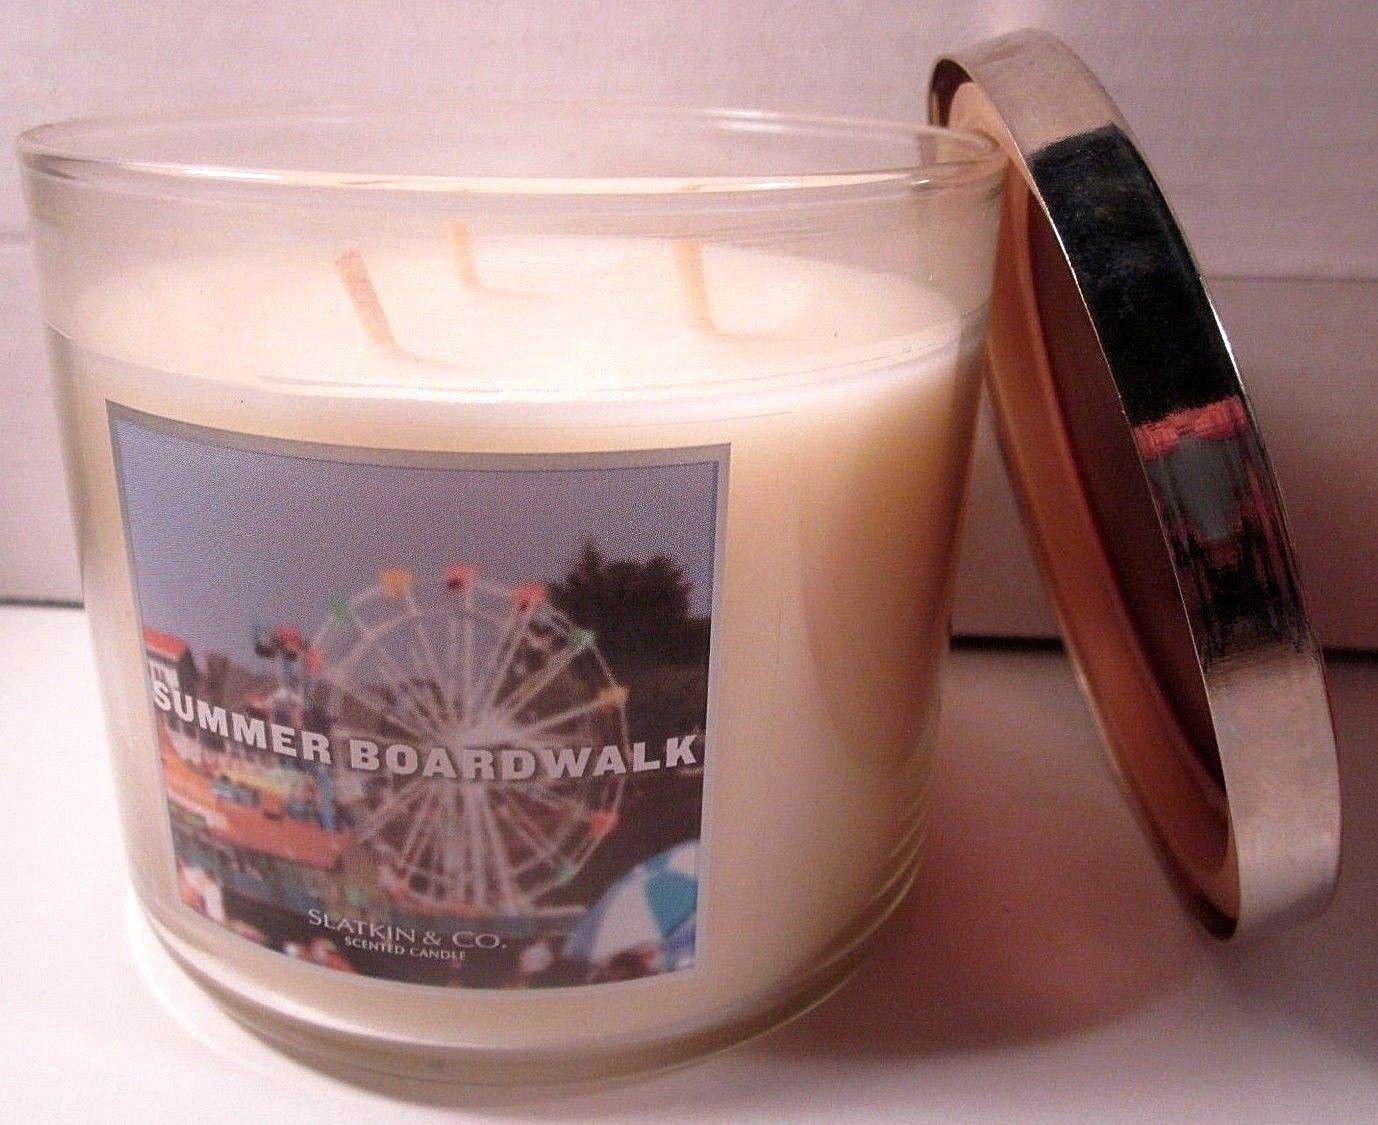 Bath & Body Works 3 wick 14.5 oz Candle Slatkin Summer Boardwalk